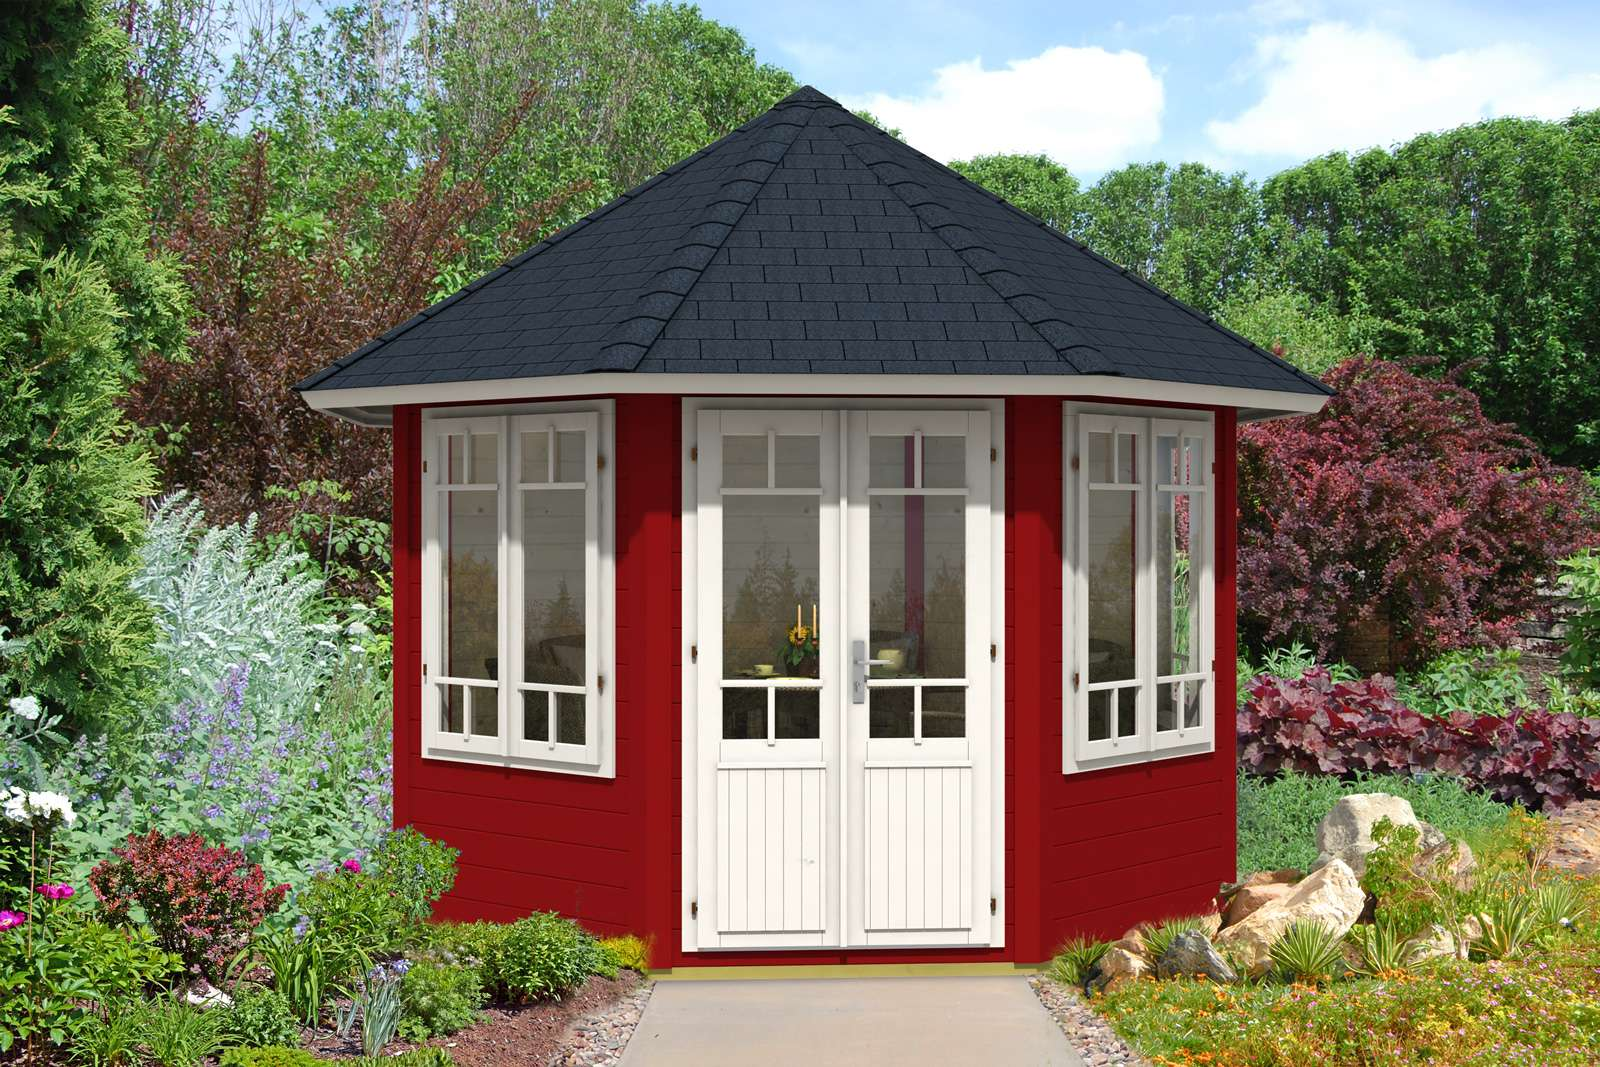 Holzpavillon kaufen   Holz Pavillon Bausätze vom Fachmann